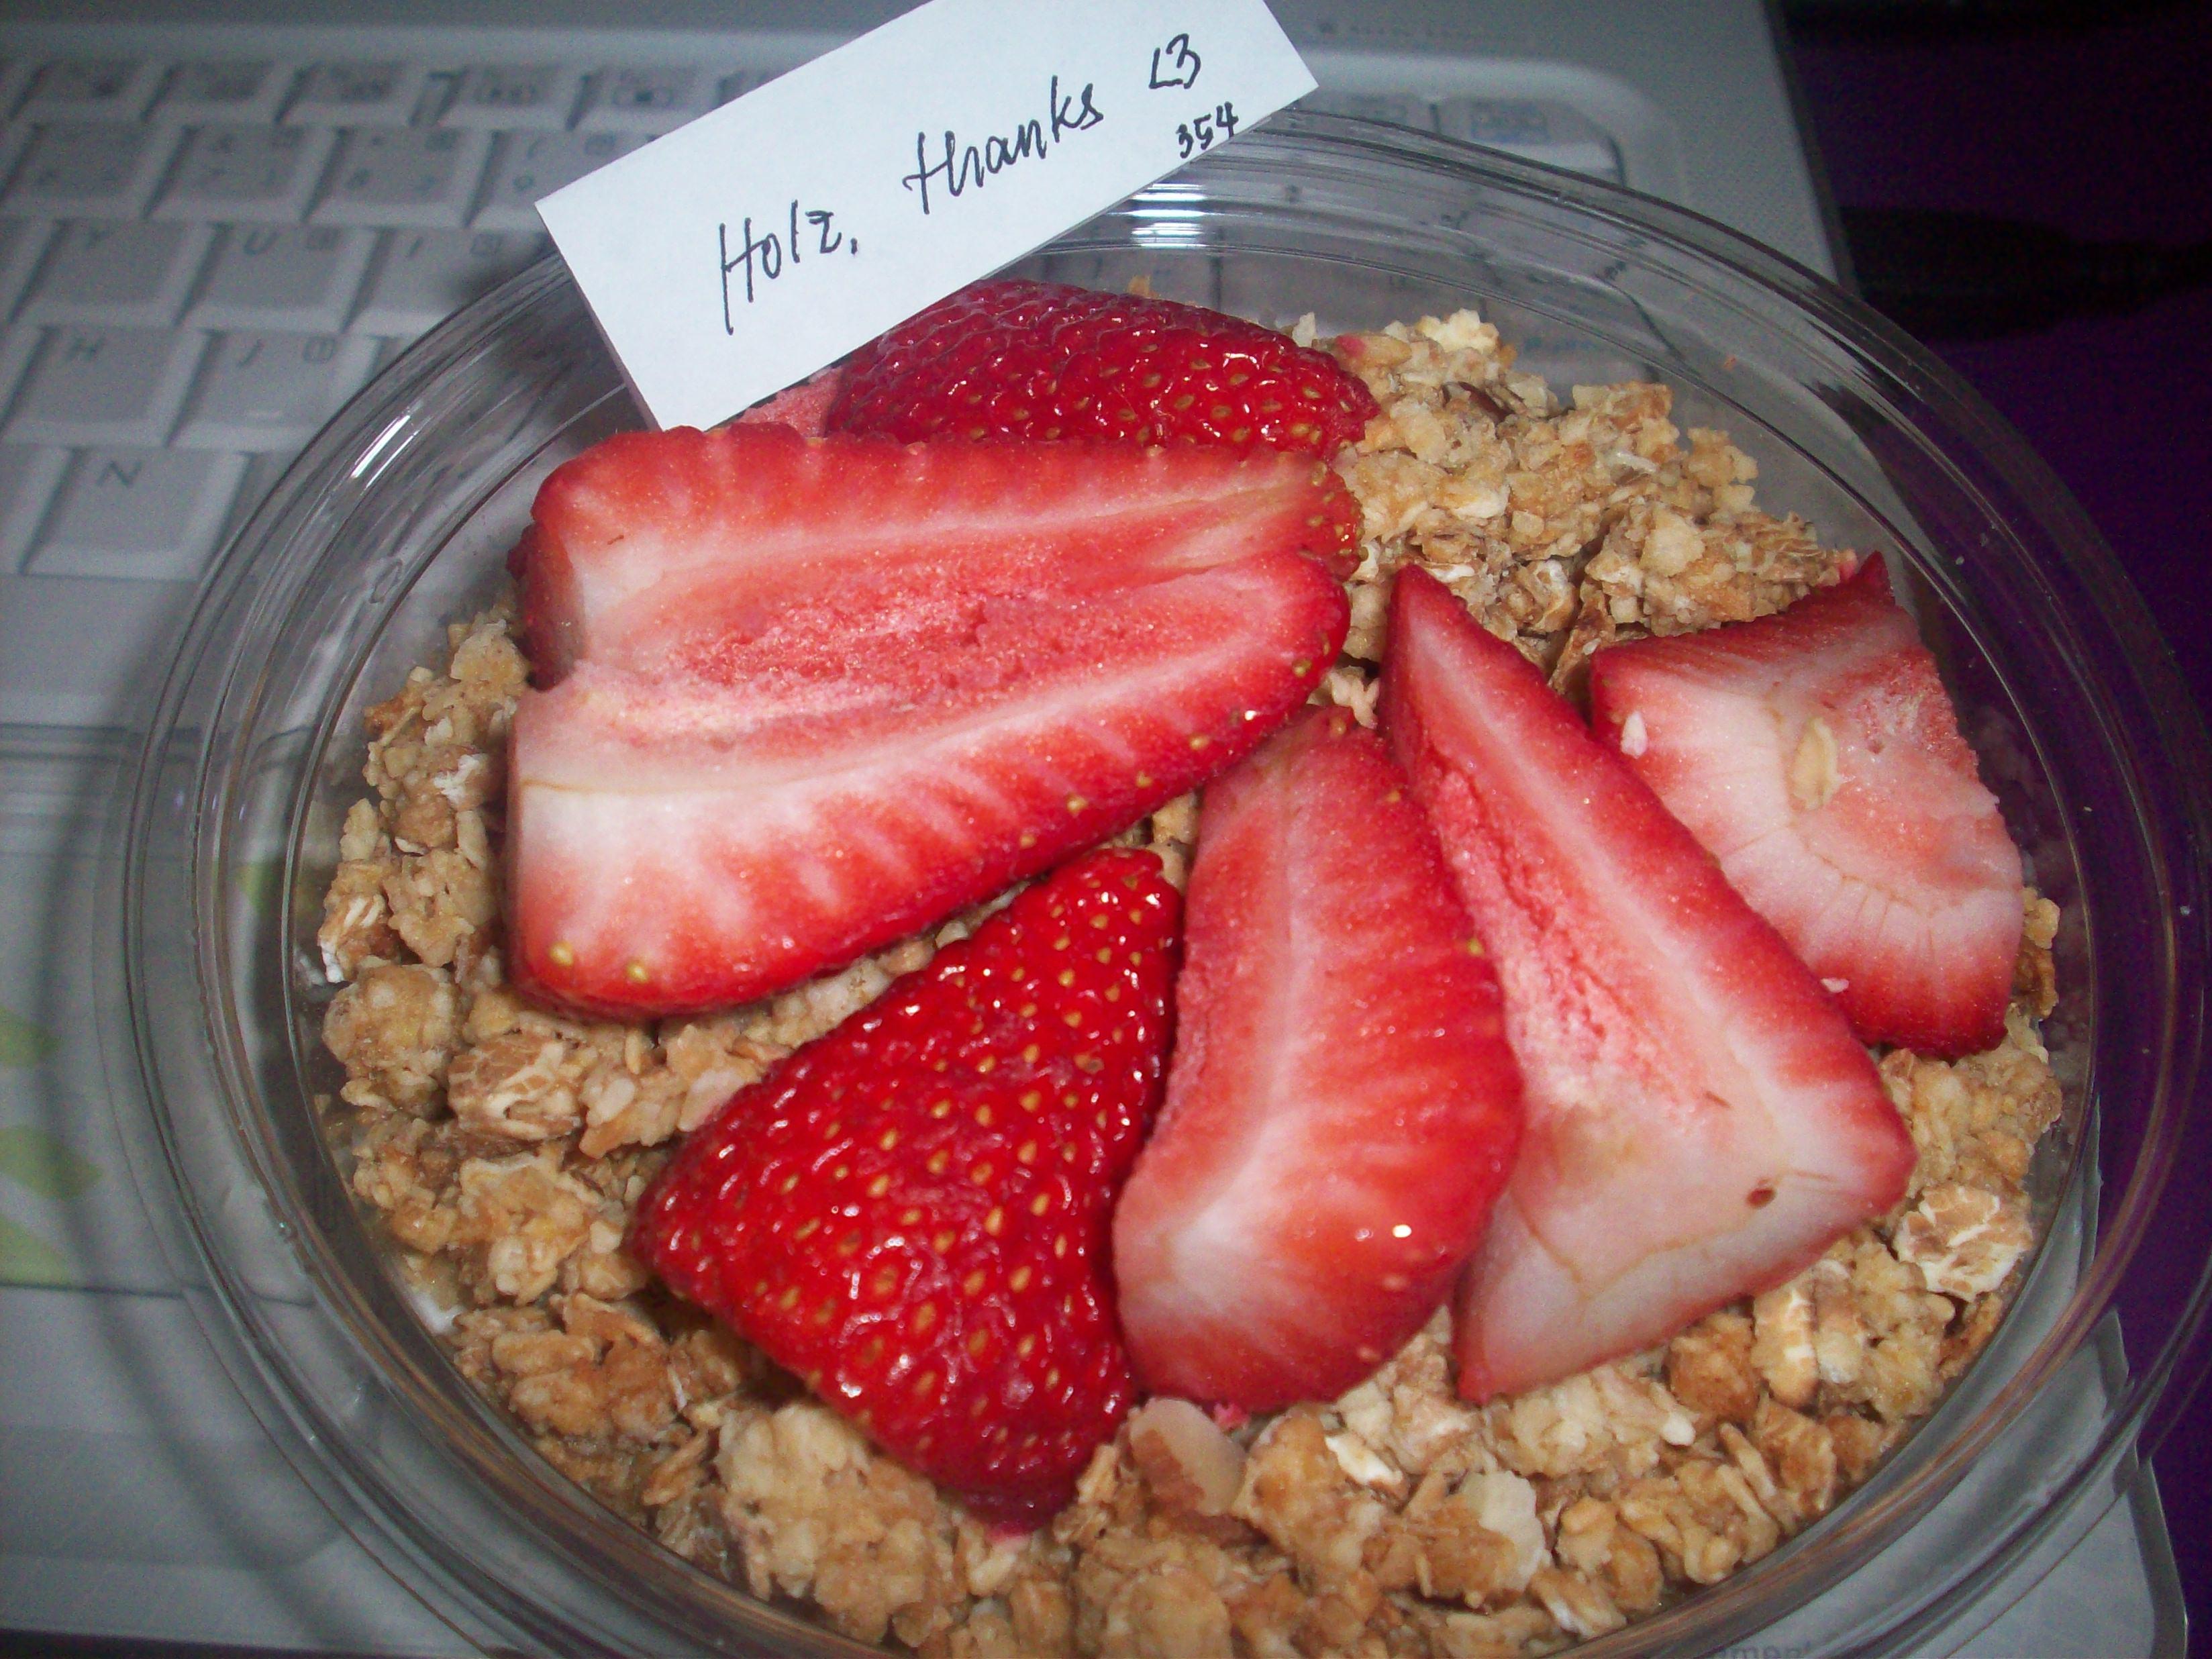 http://foodloader.net/cutie_2010-05-05_Strawberry_Yogurt_Bowl.jpg